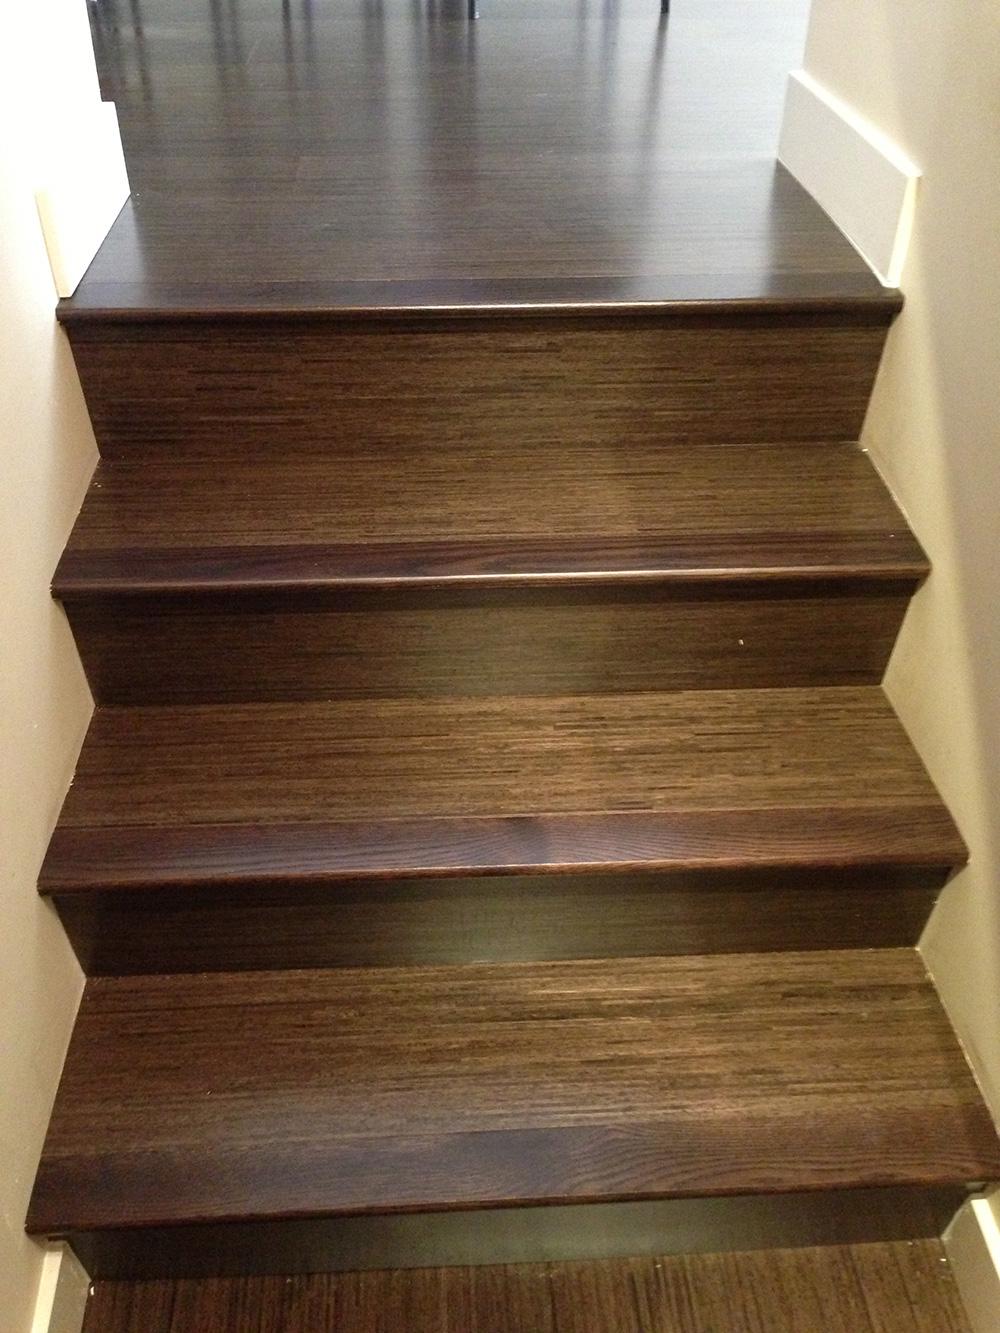 Wood or laminate flooring finest laminate flooring u for Zerorez hardwood floors